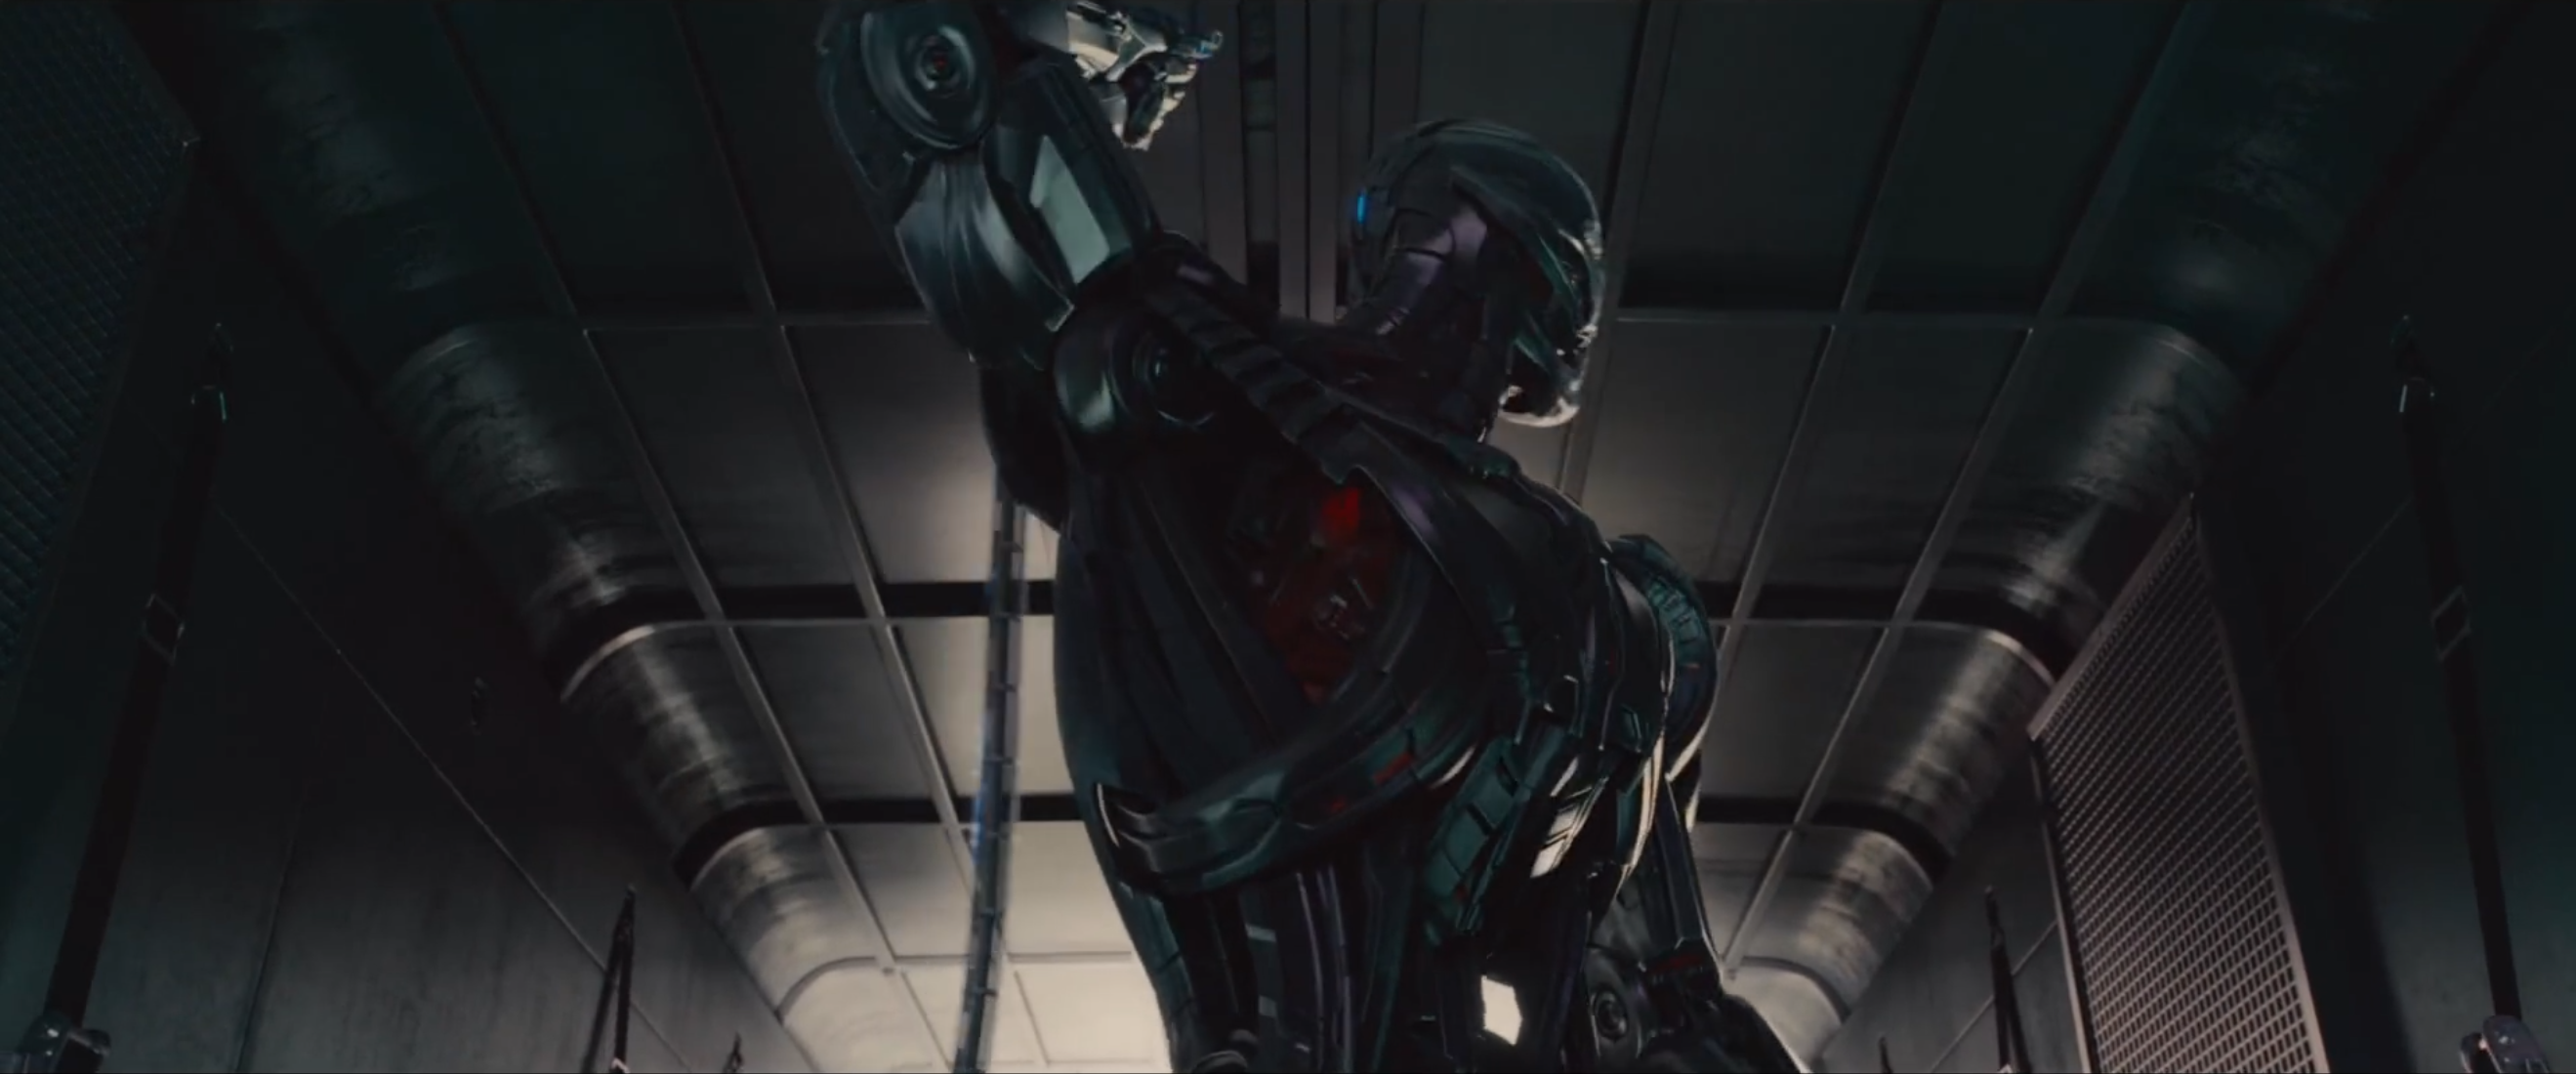 Avengers: un'immagine di Ultron dal trailer